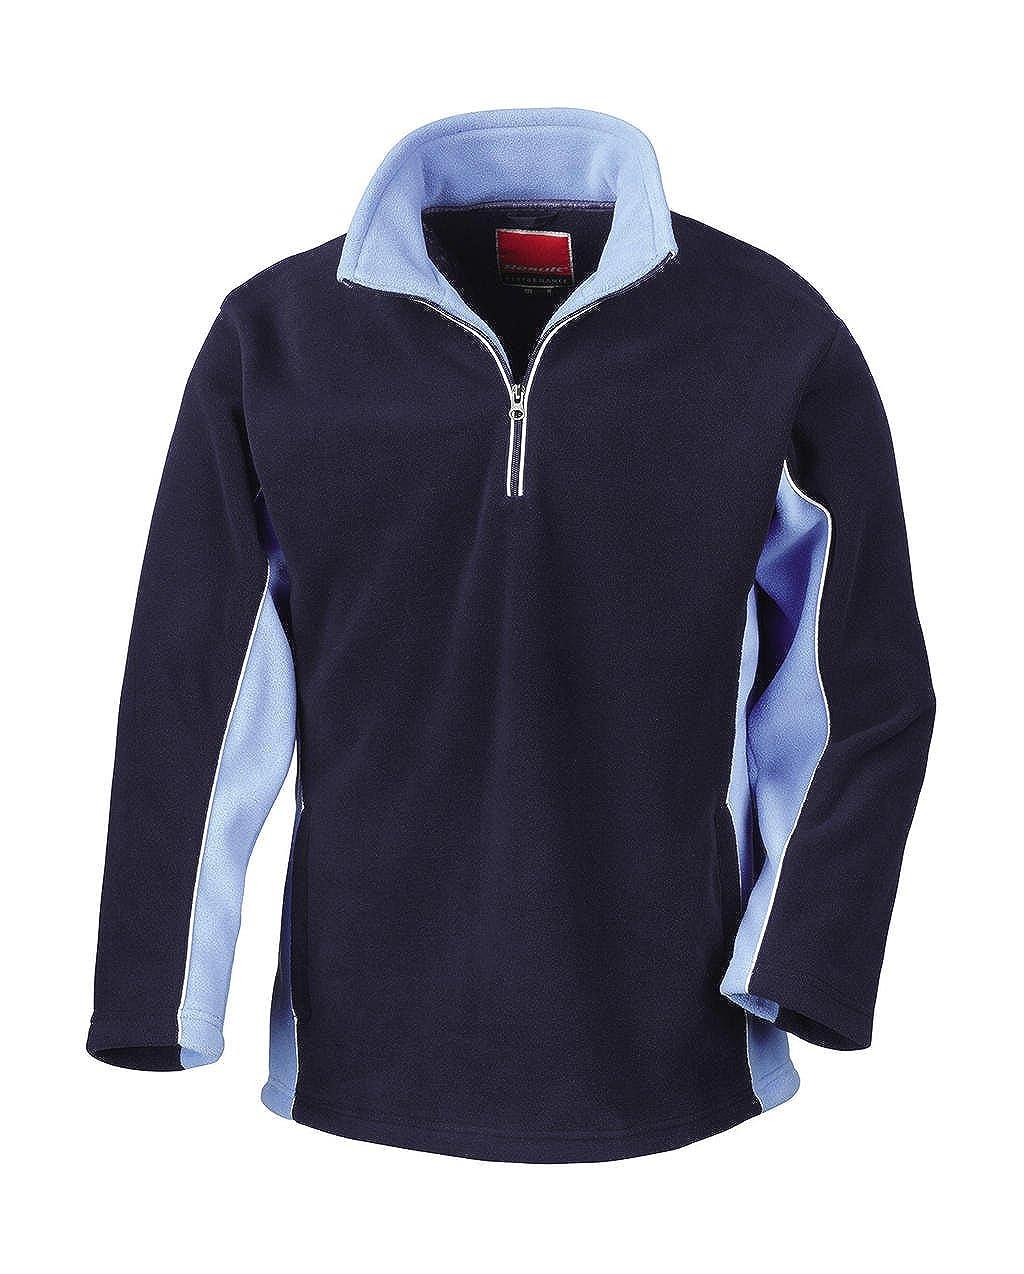 Tech3 Fleece-Sportsweatshirt mit 1/4 Reißverschluss R86X